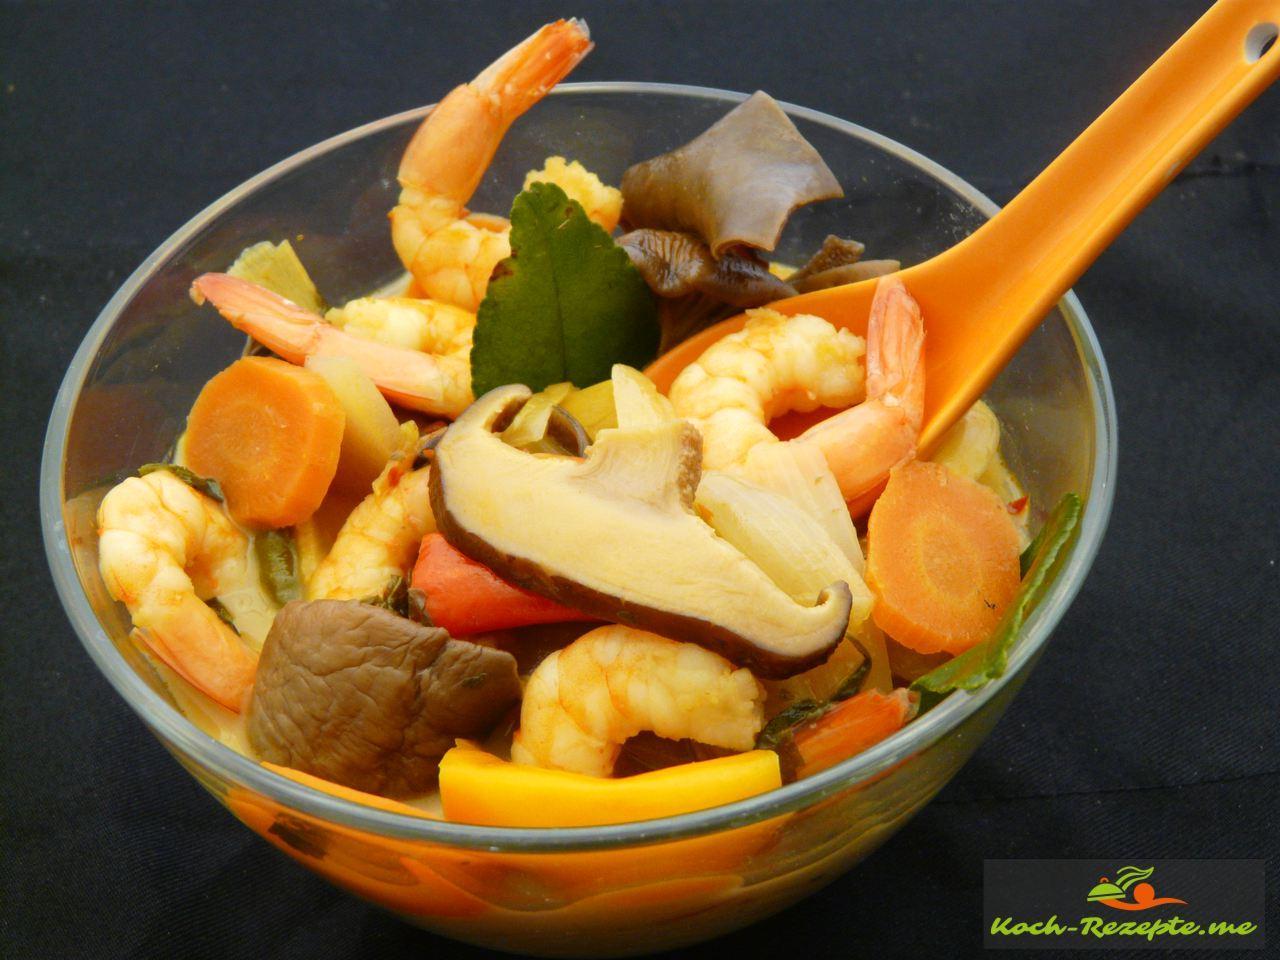 Die fertige Suppe Tom Yam Gung